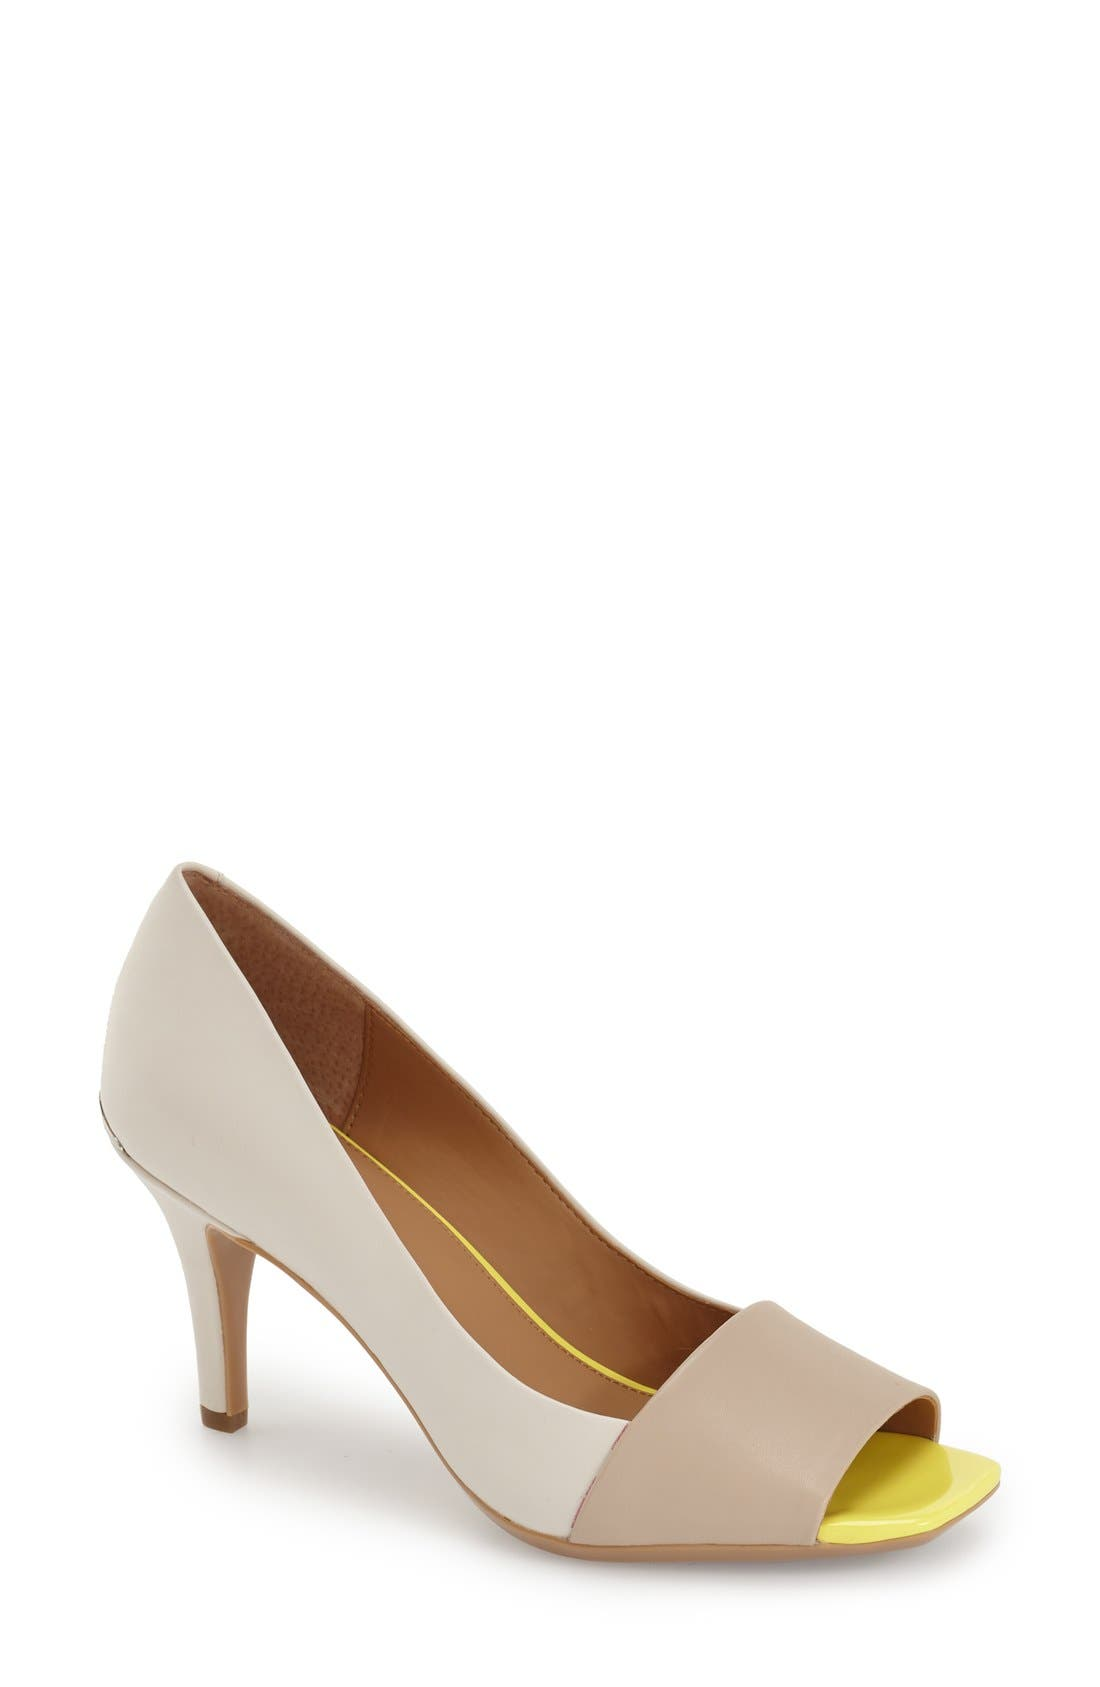 Alternate Image 1 Selected - Calvin Klein 'Nareen' Square Open Toe Pump (Women)